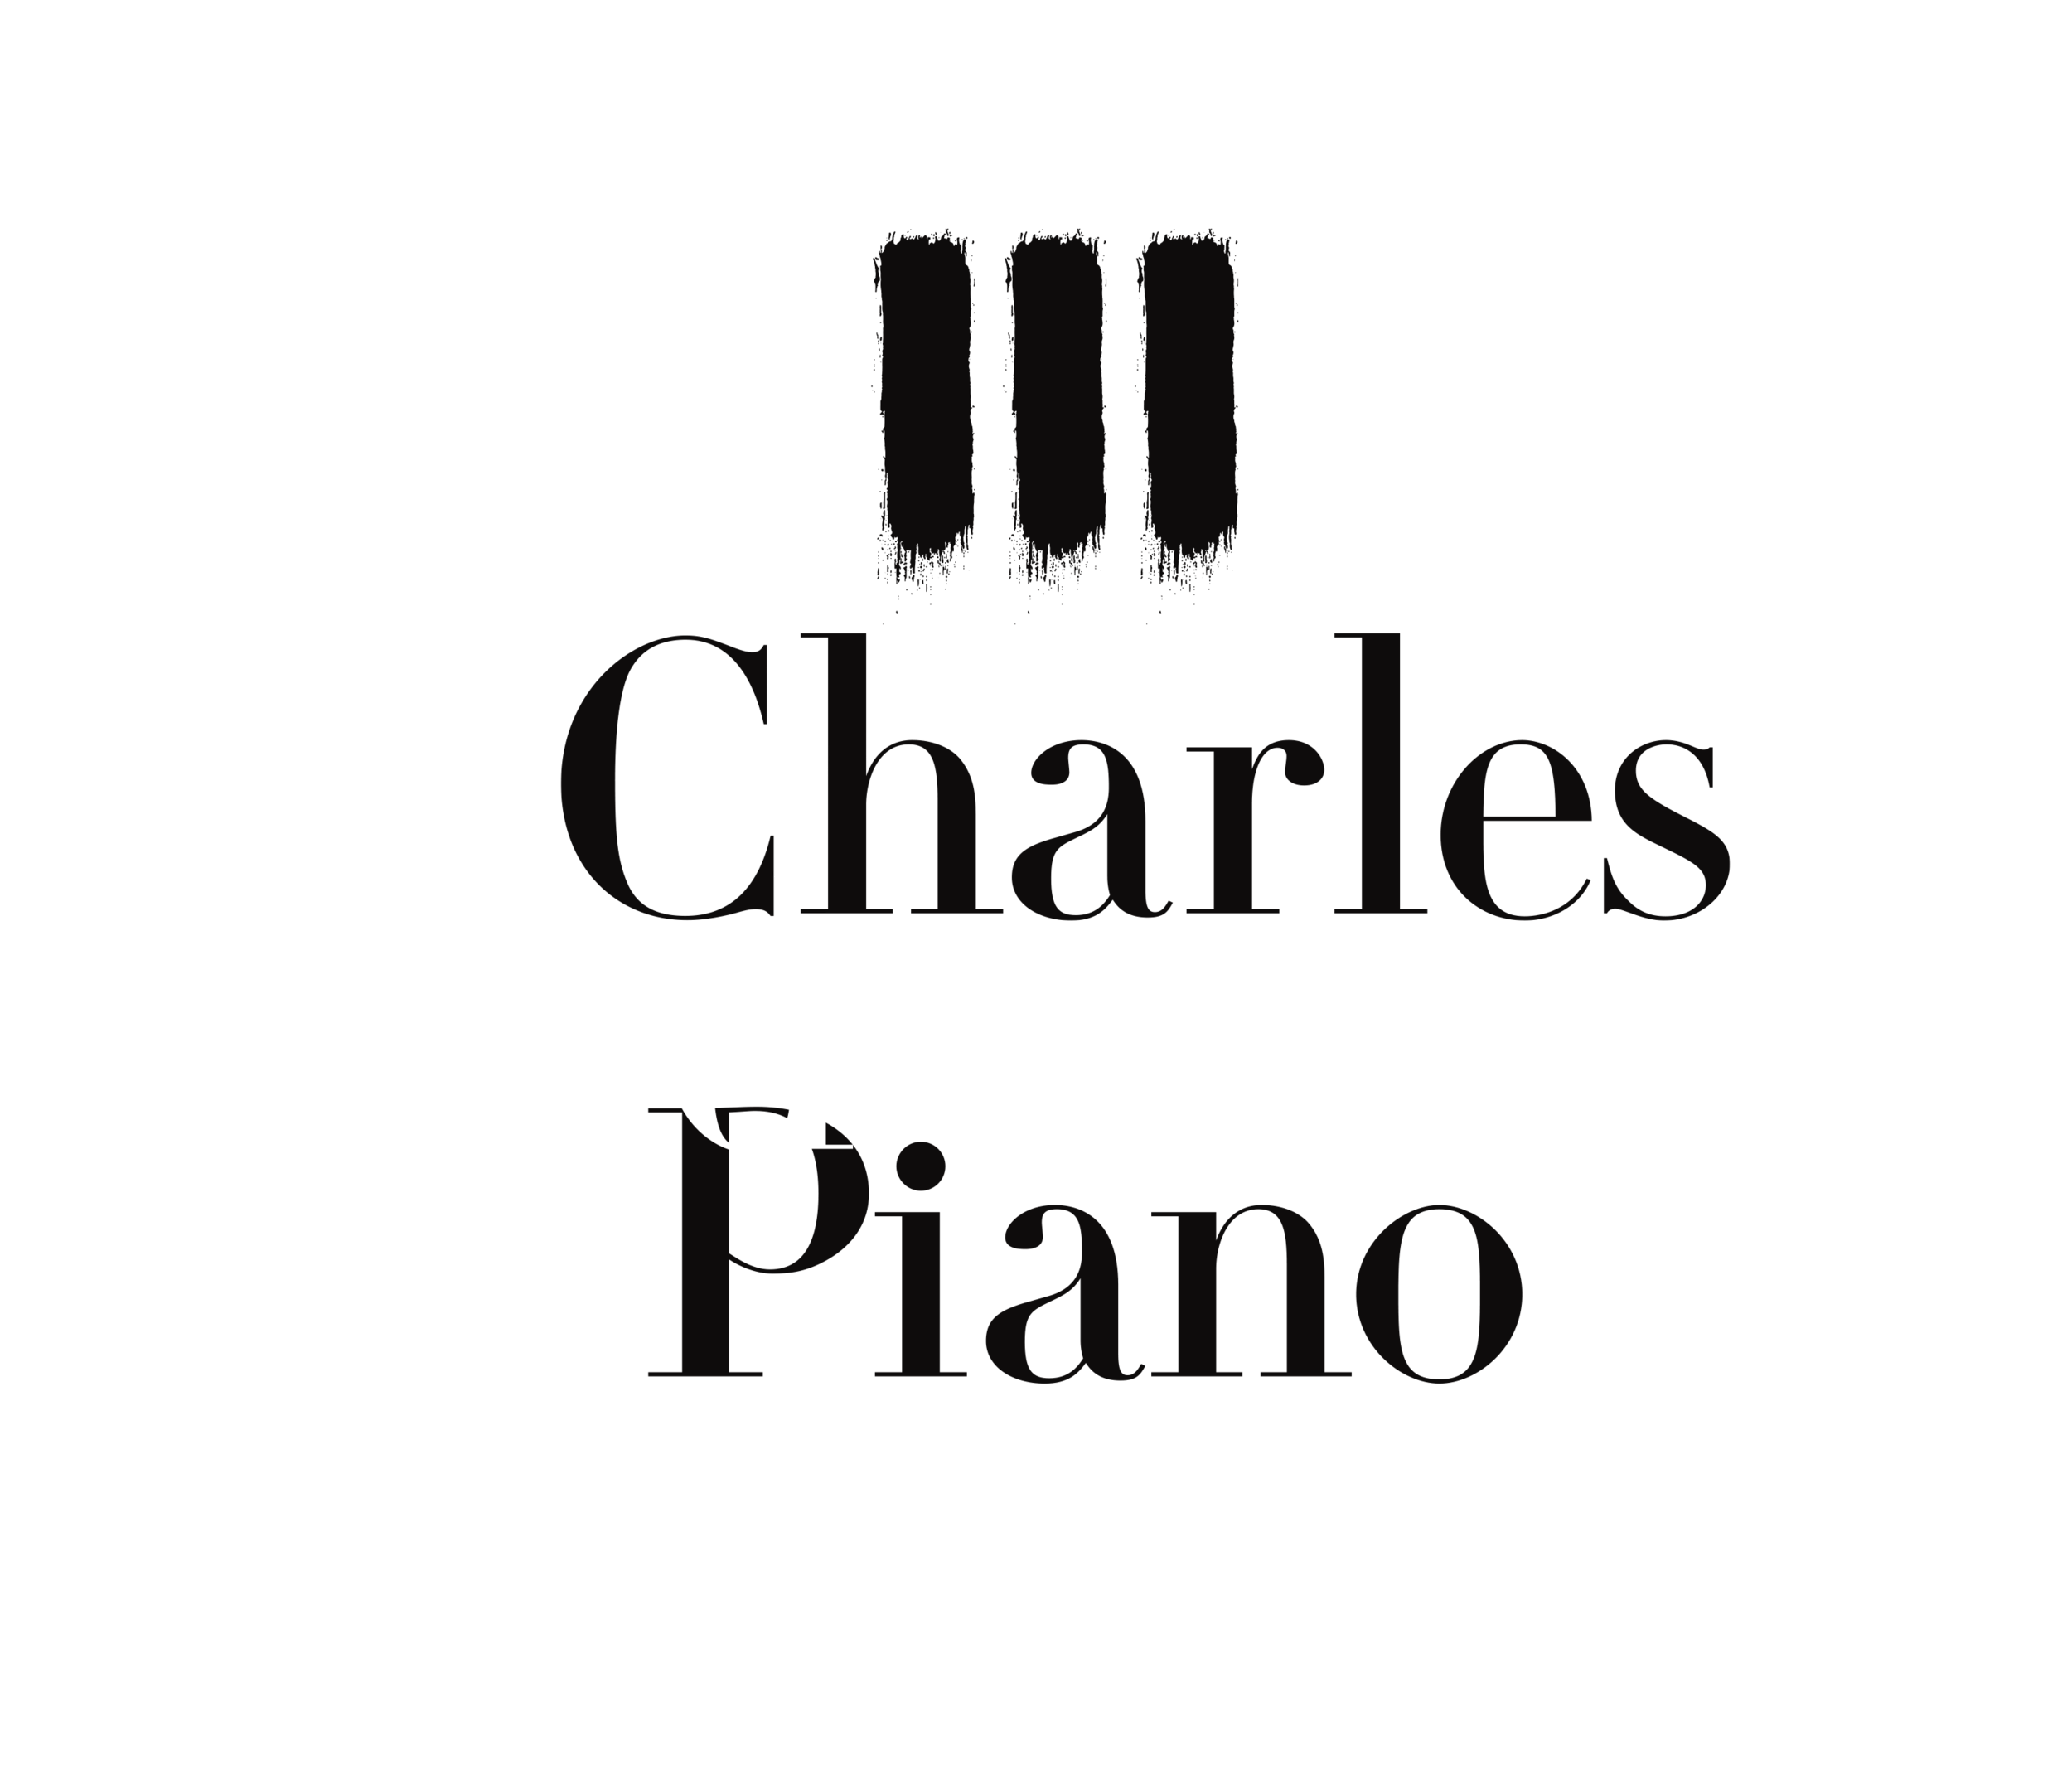 Wadsworth_logo.png